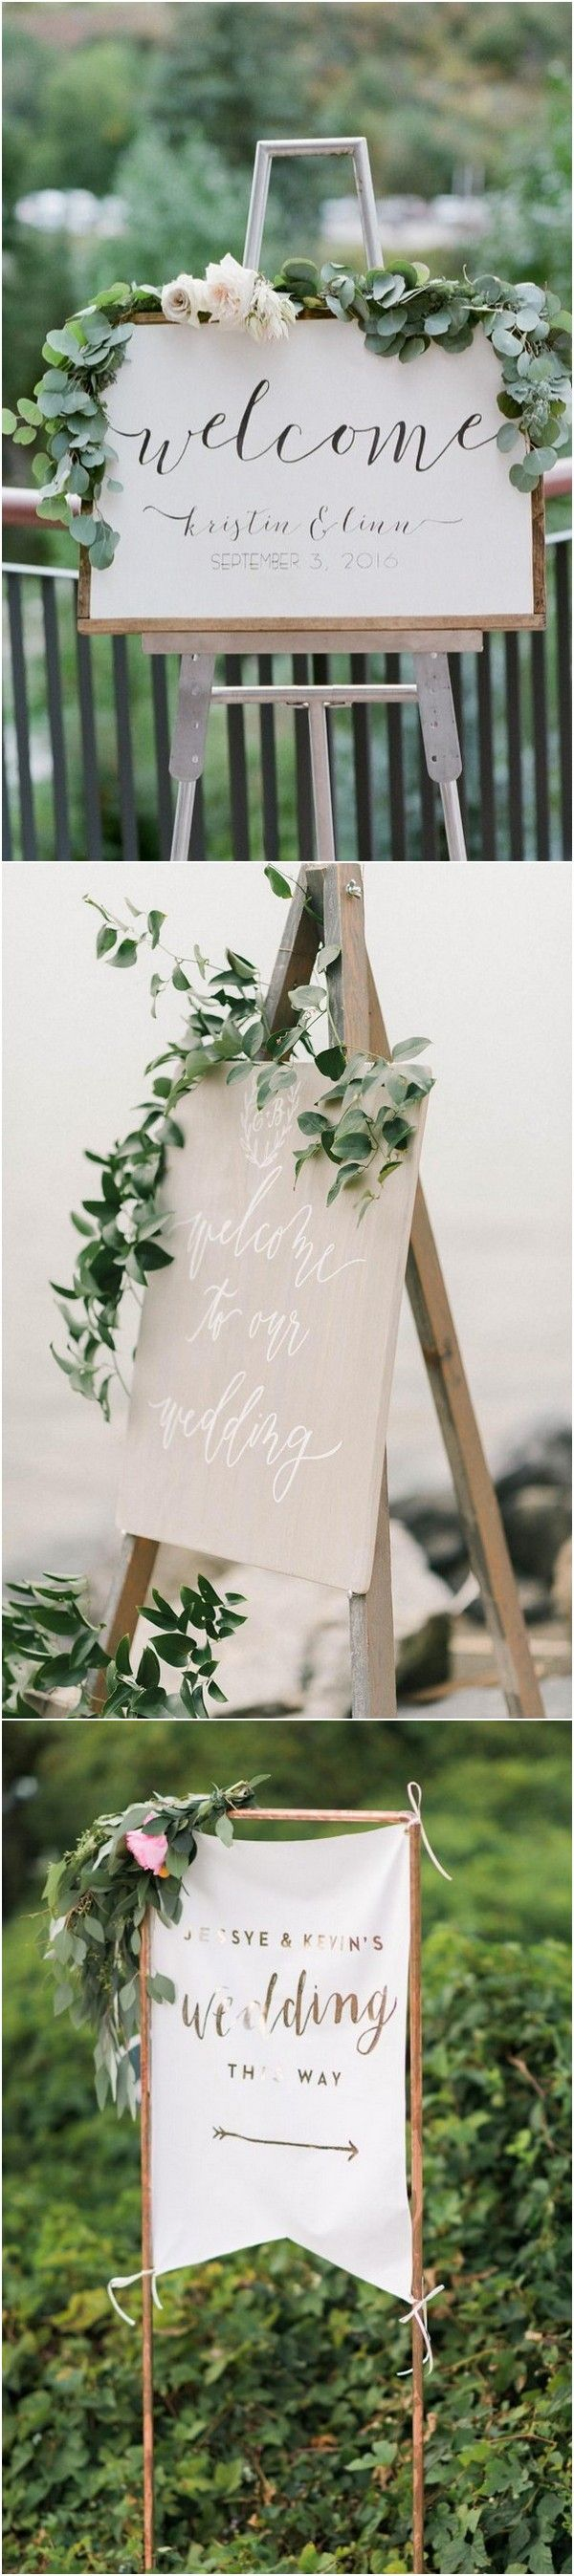 15 Chic Greenery Wedding Signs for 2018 Trends Weddingideas Chic